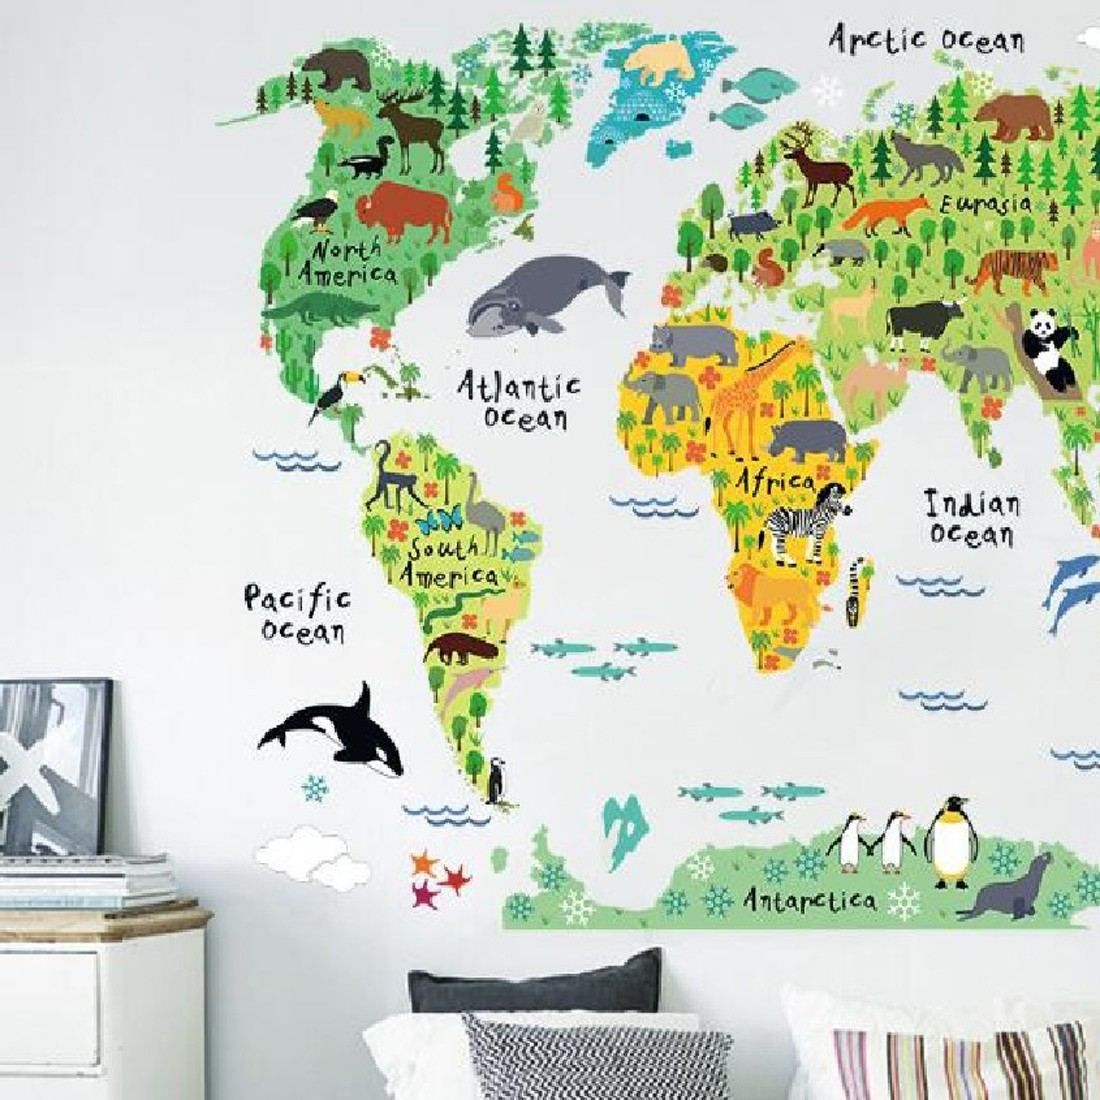 Removable diy mural wallpaper animal world map wall - Sticker mural leroy merlin ...